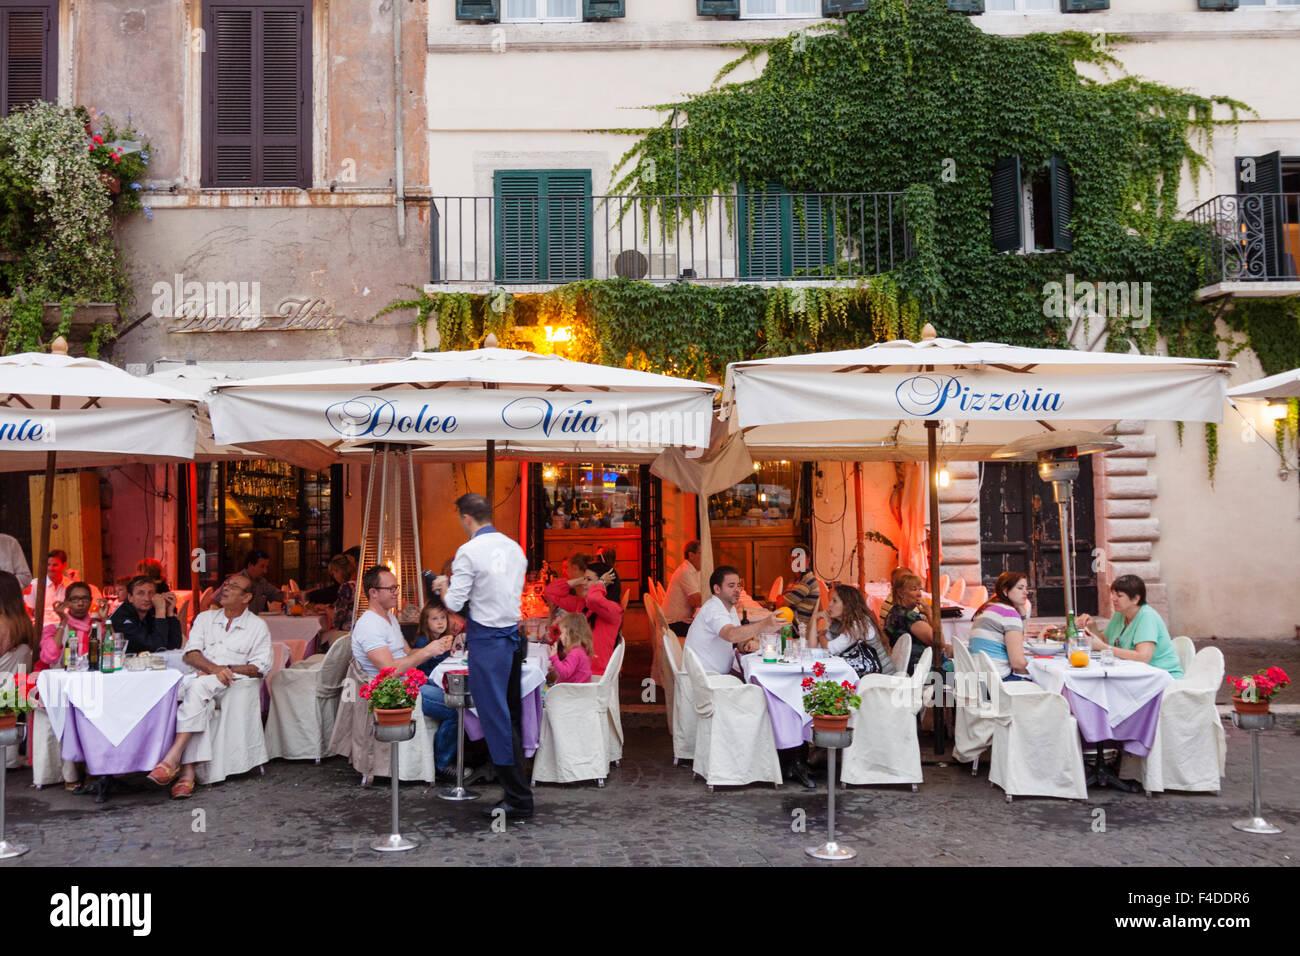 Alfresco dining at Piazza Navona, Rome, Italy - Stock Image